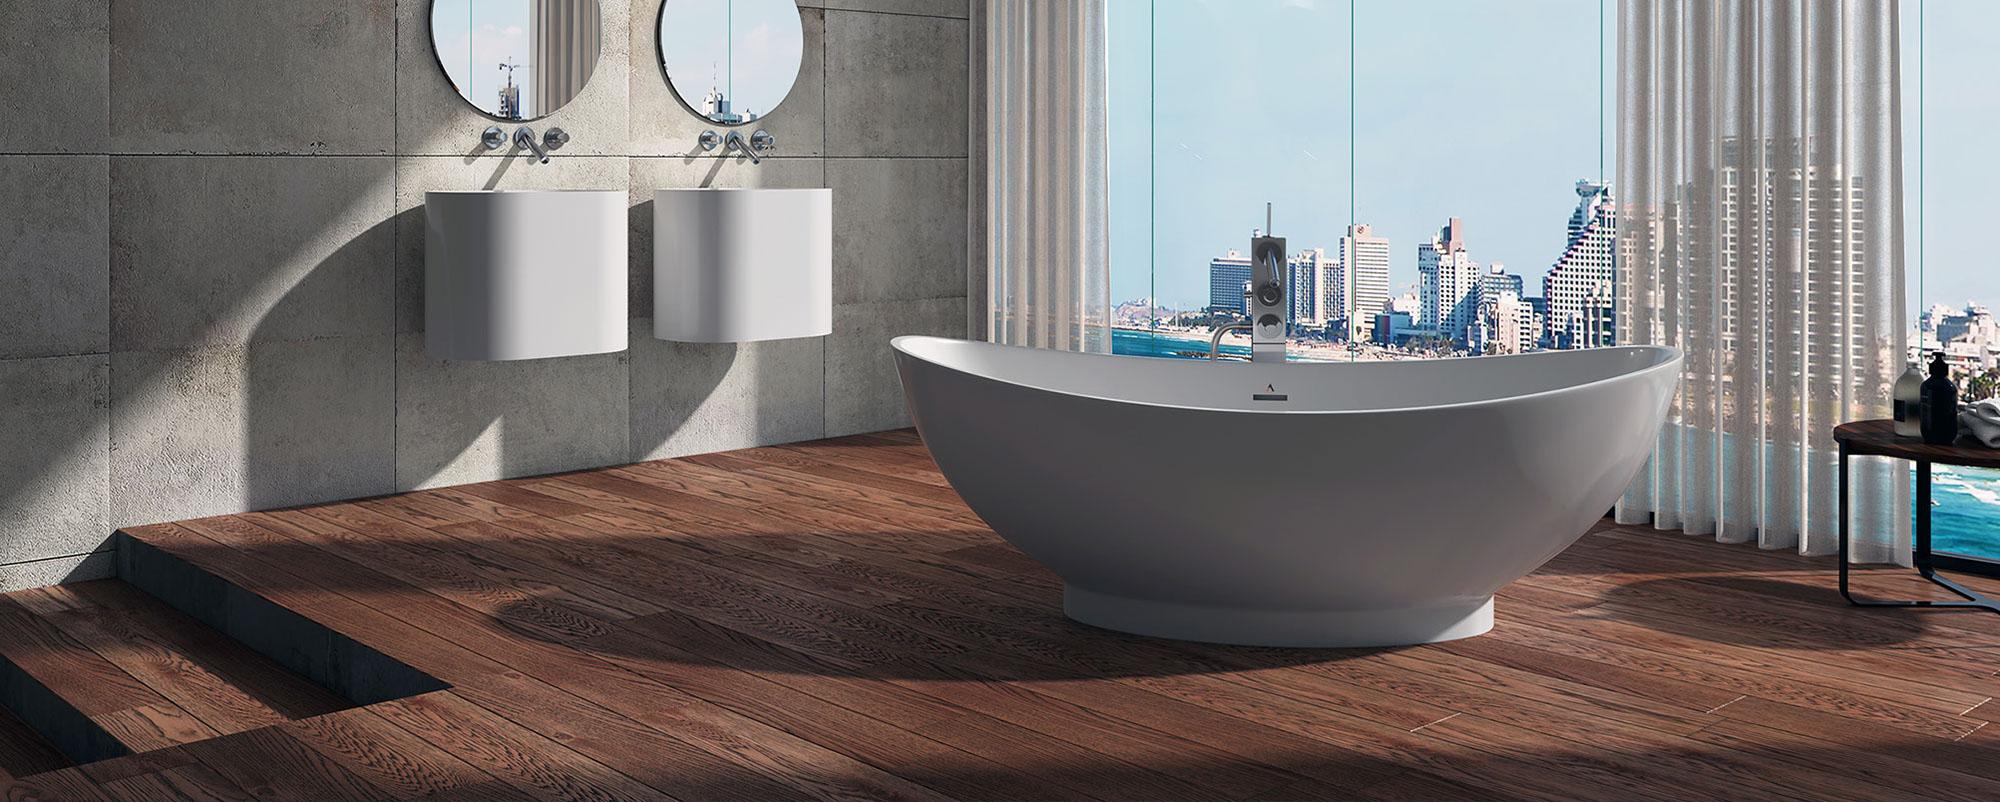 Americh Luxurious Bathtubs